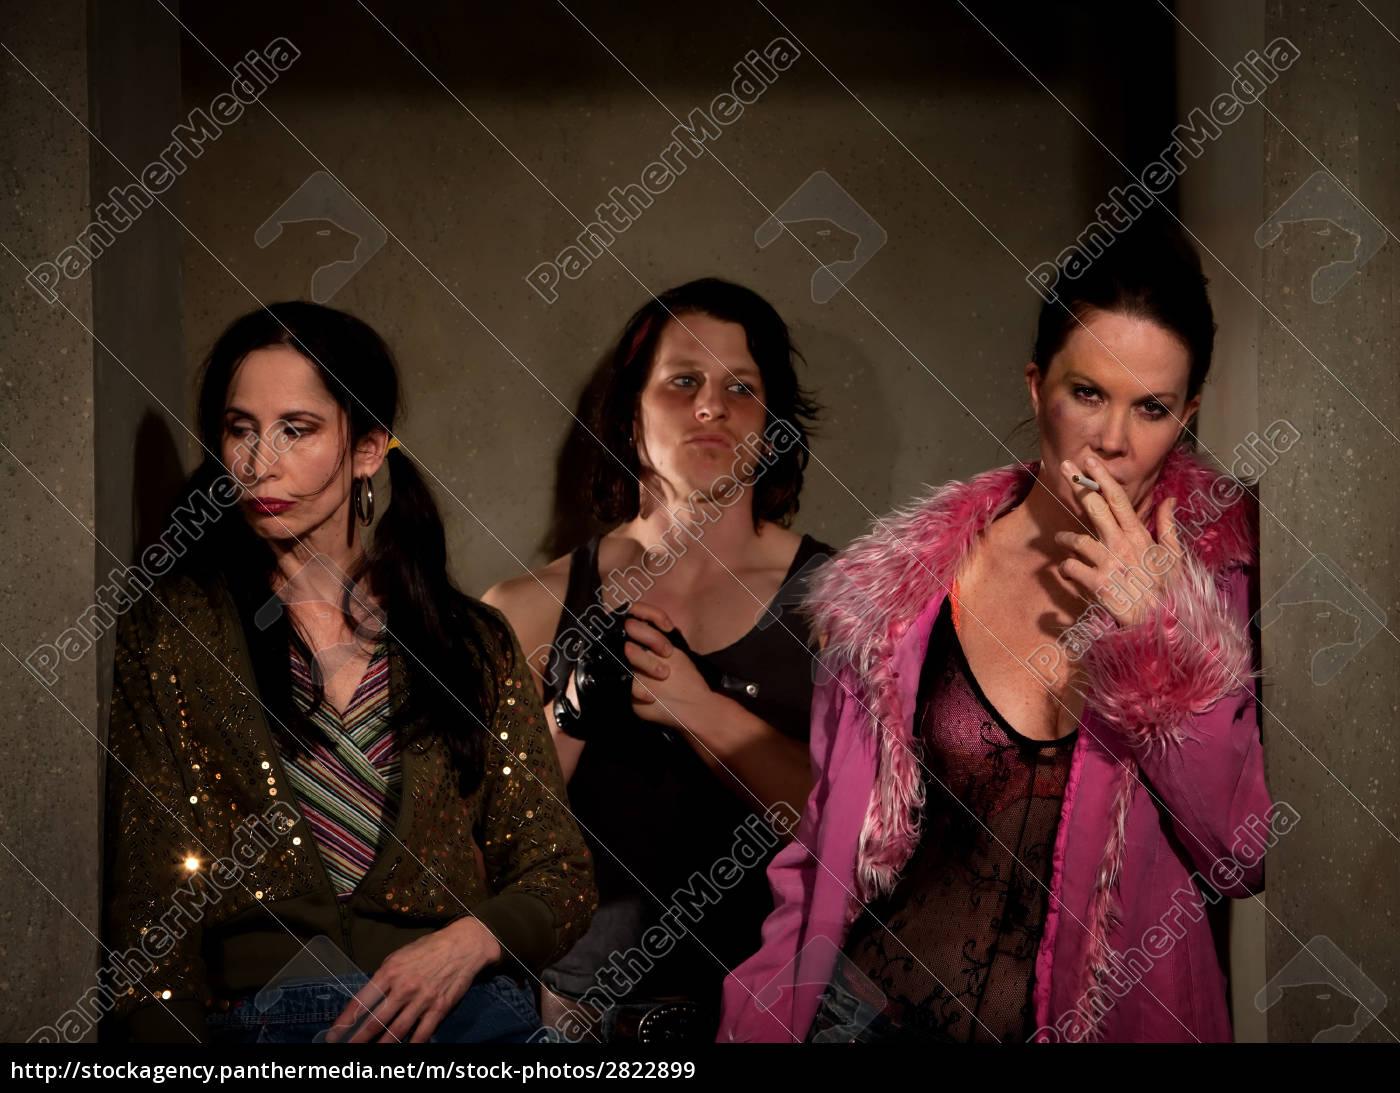 frightened, prostitutes, in, hallway, with, pimp - 2822899